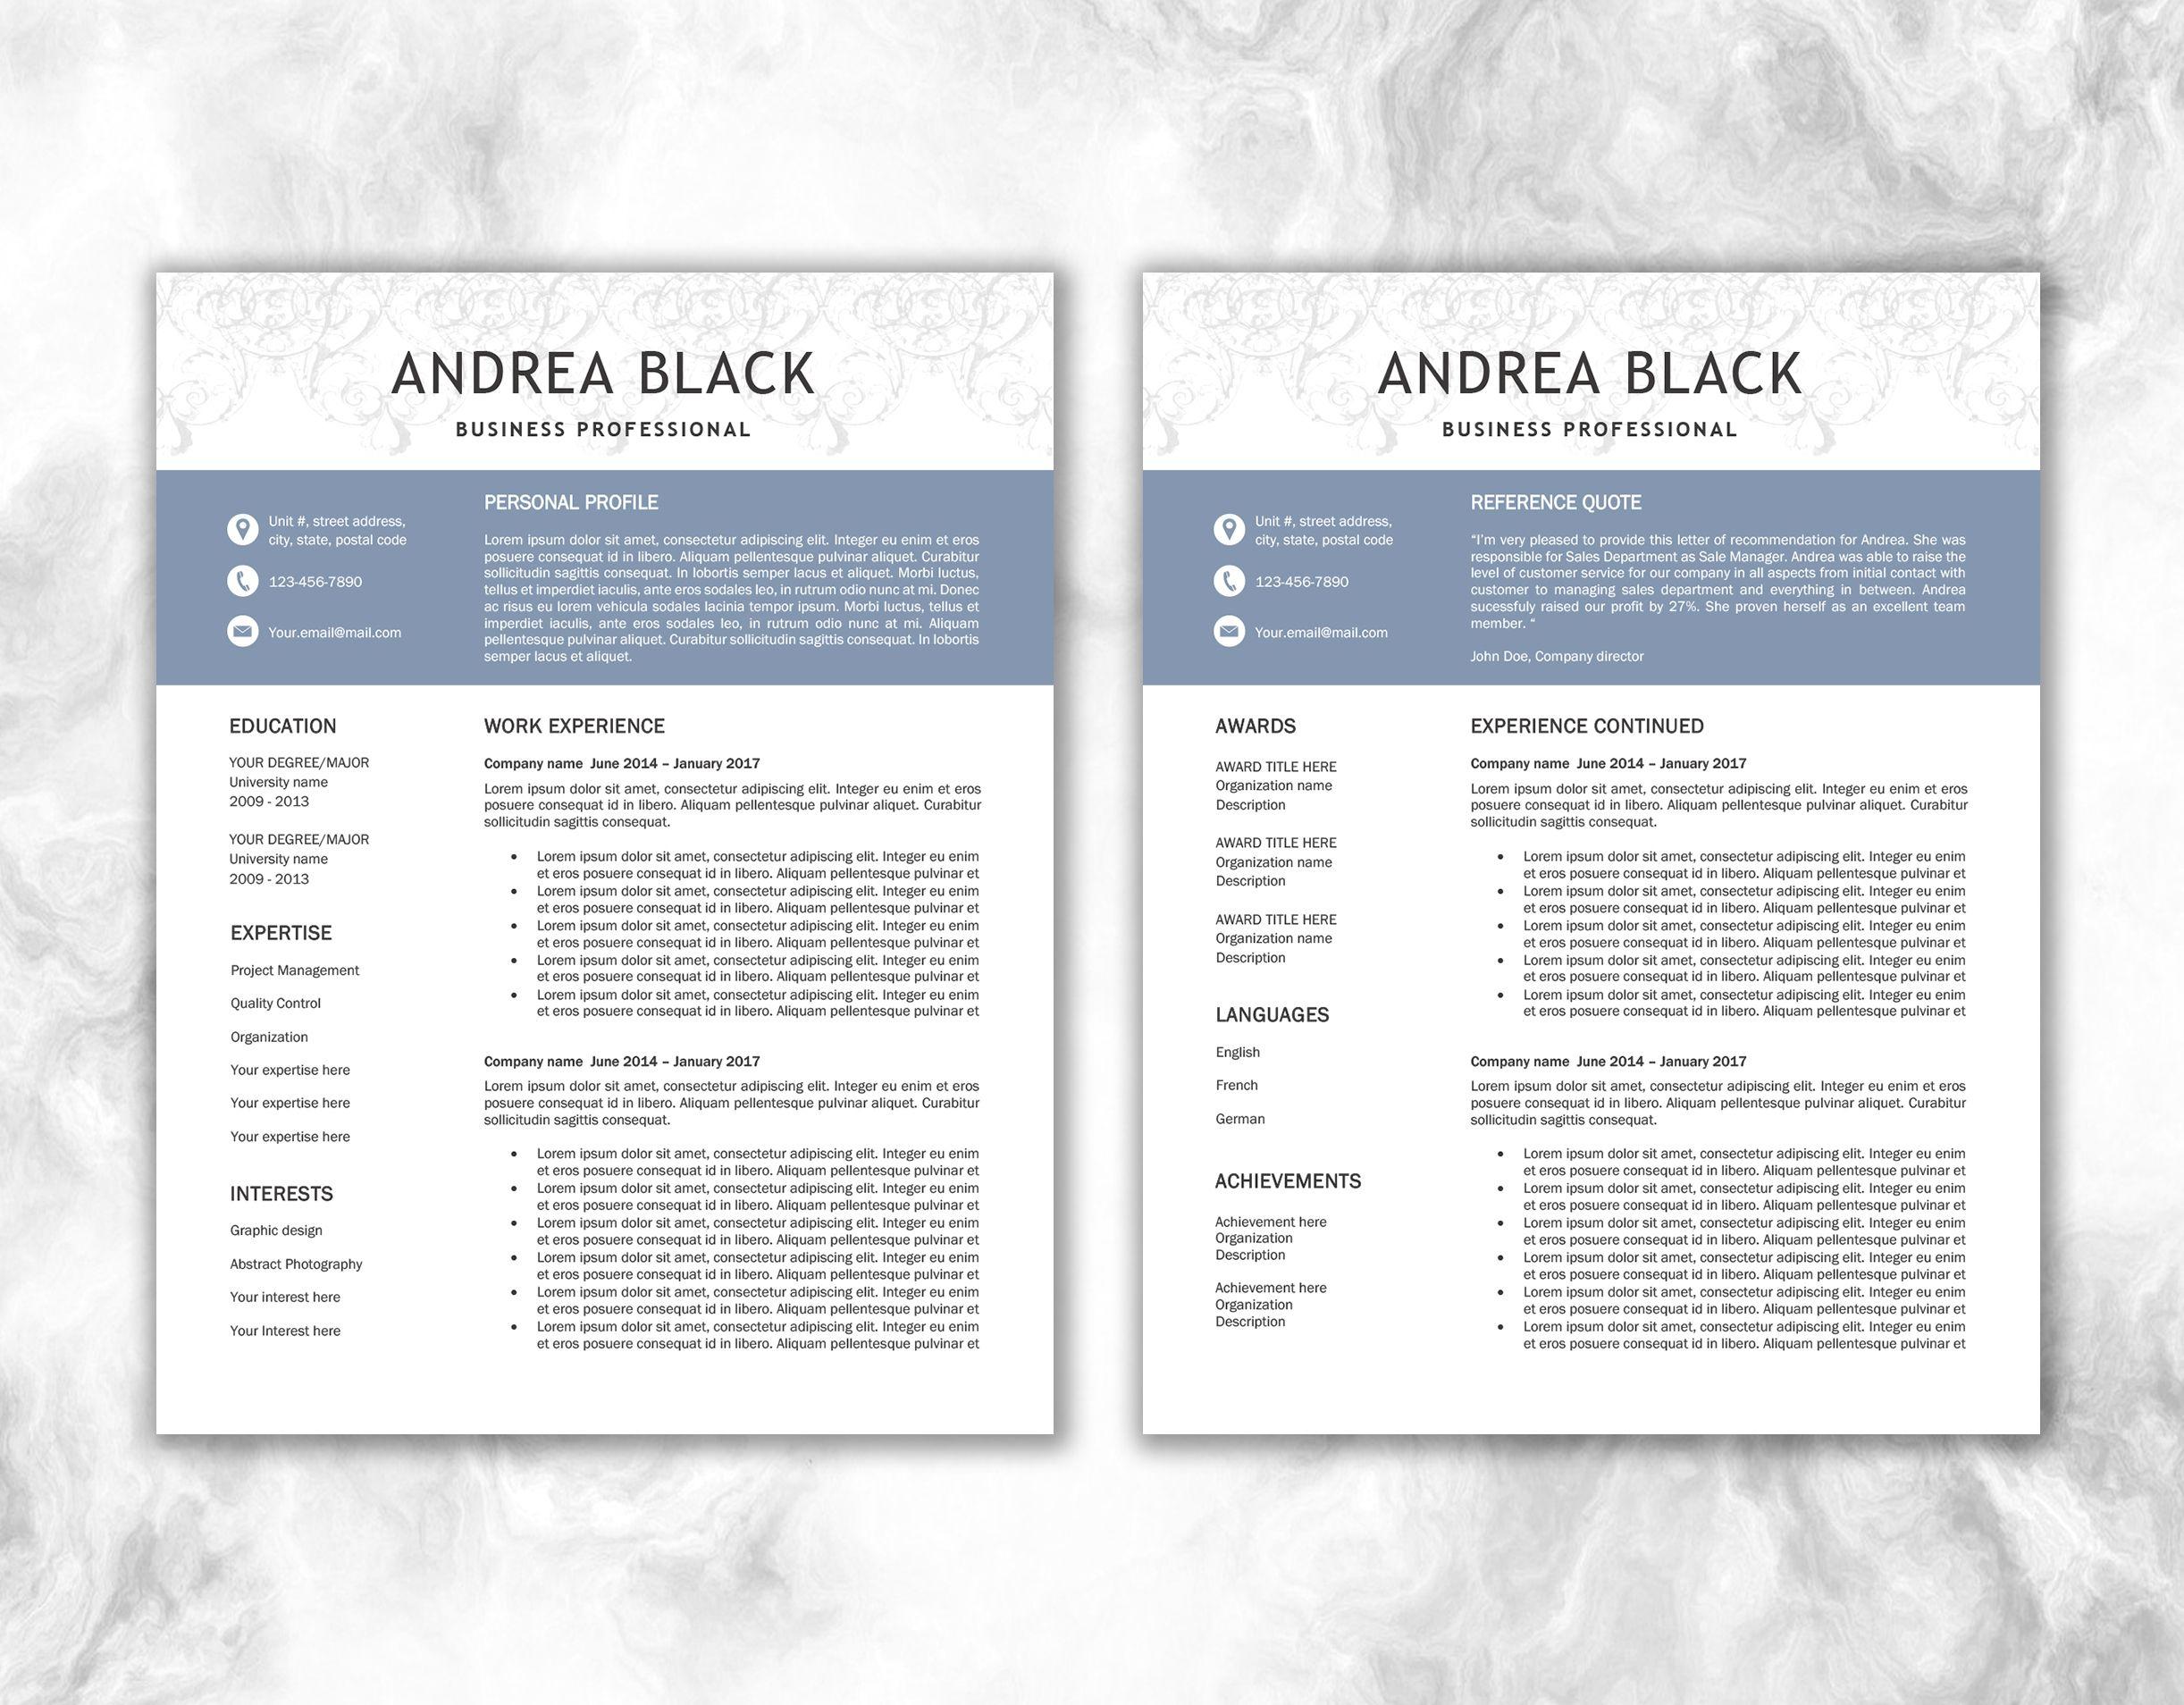 Pin by Document Folder on Document Folder Shop - Resume   CV ...